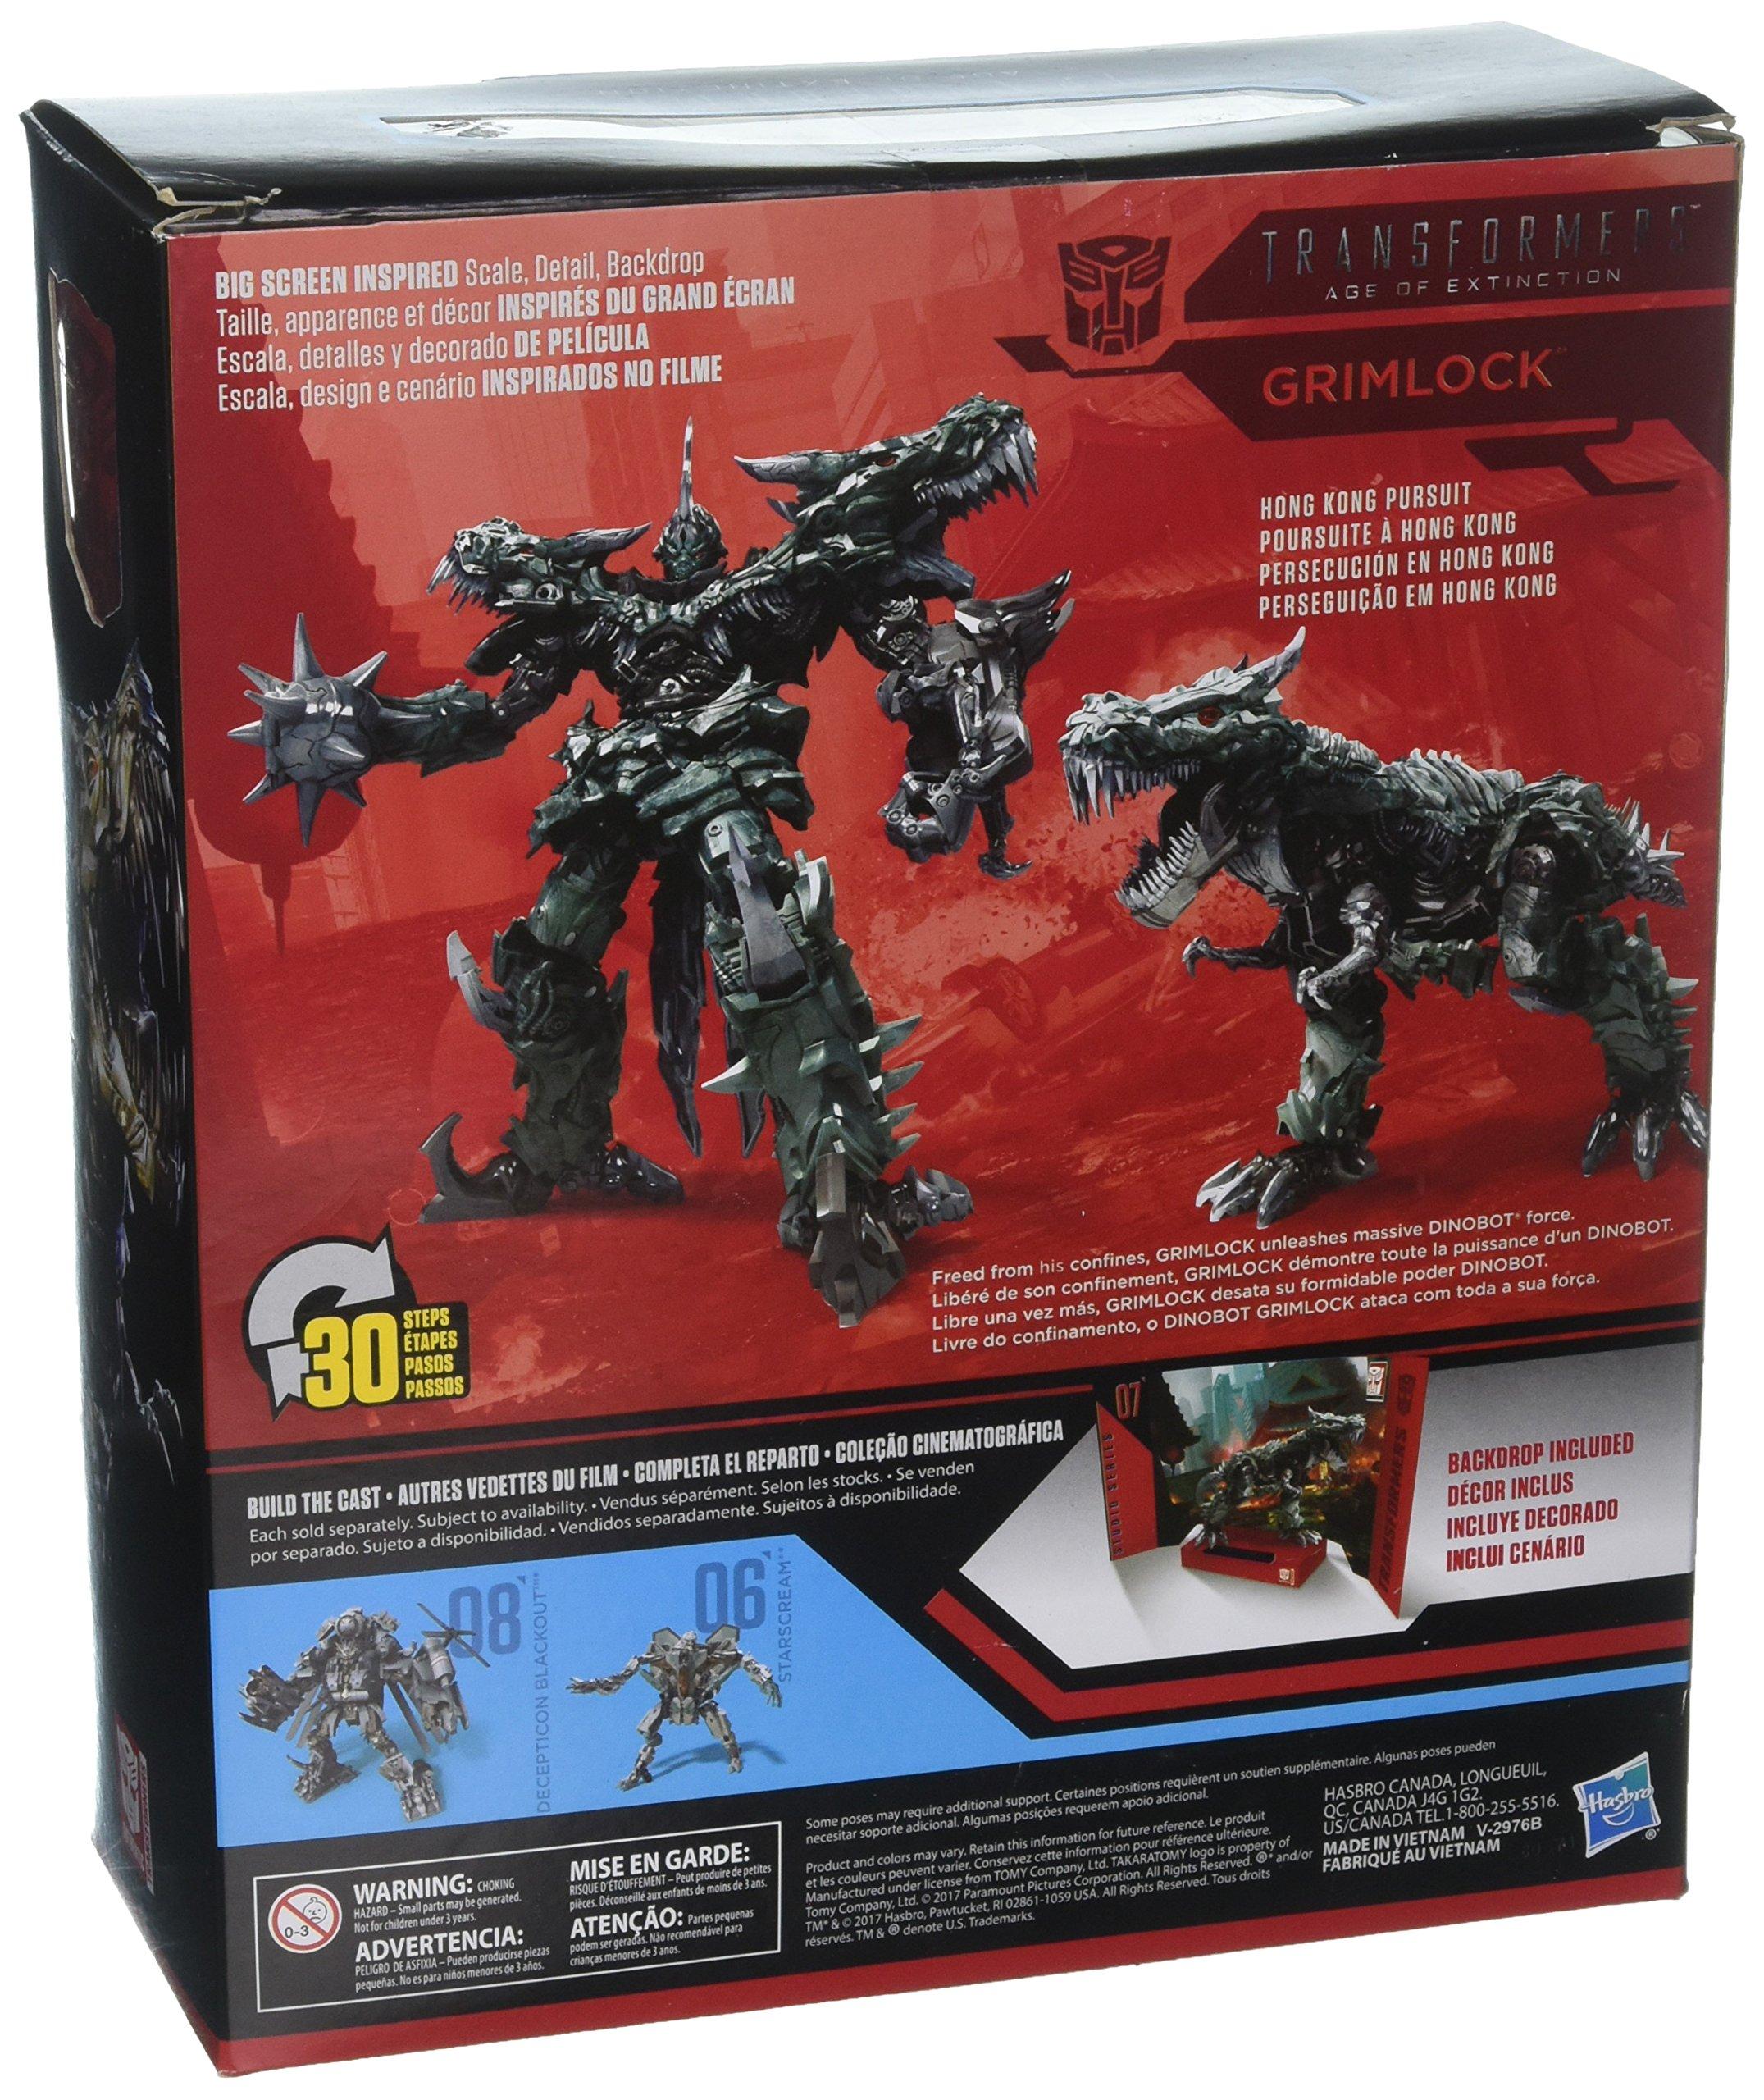 Transformers Studio Series 07 Leader Class Movie 4 Grimlock by Transformers (Image #2)